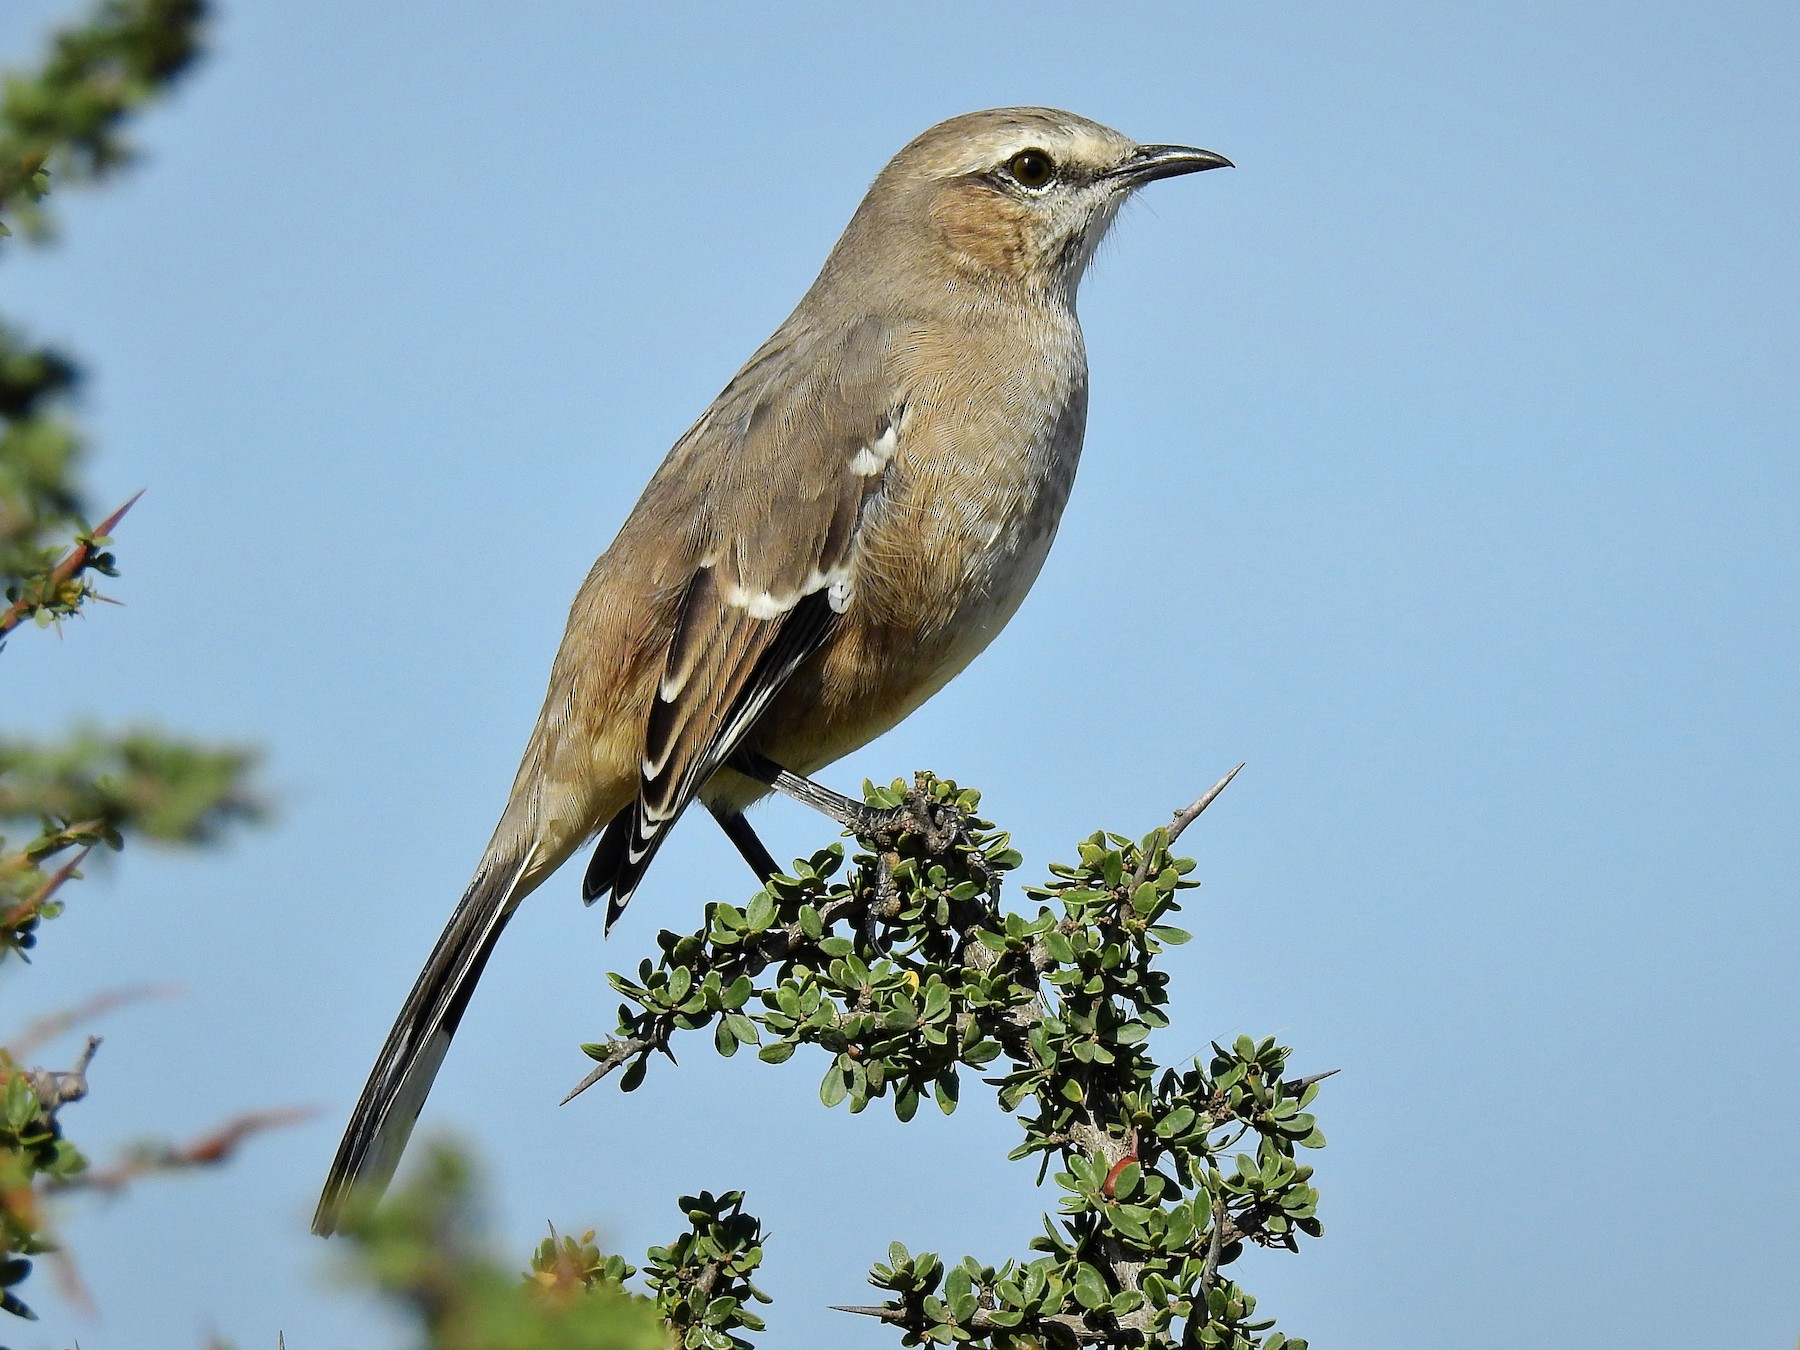 Patagonian Mockingbird - Pablo Alejandro Pla